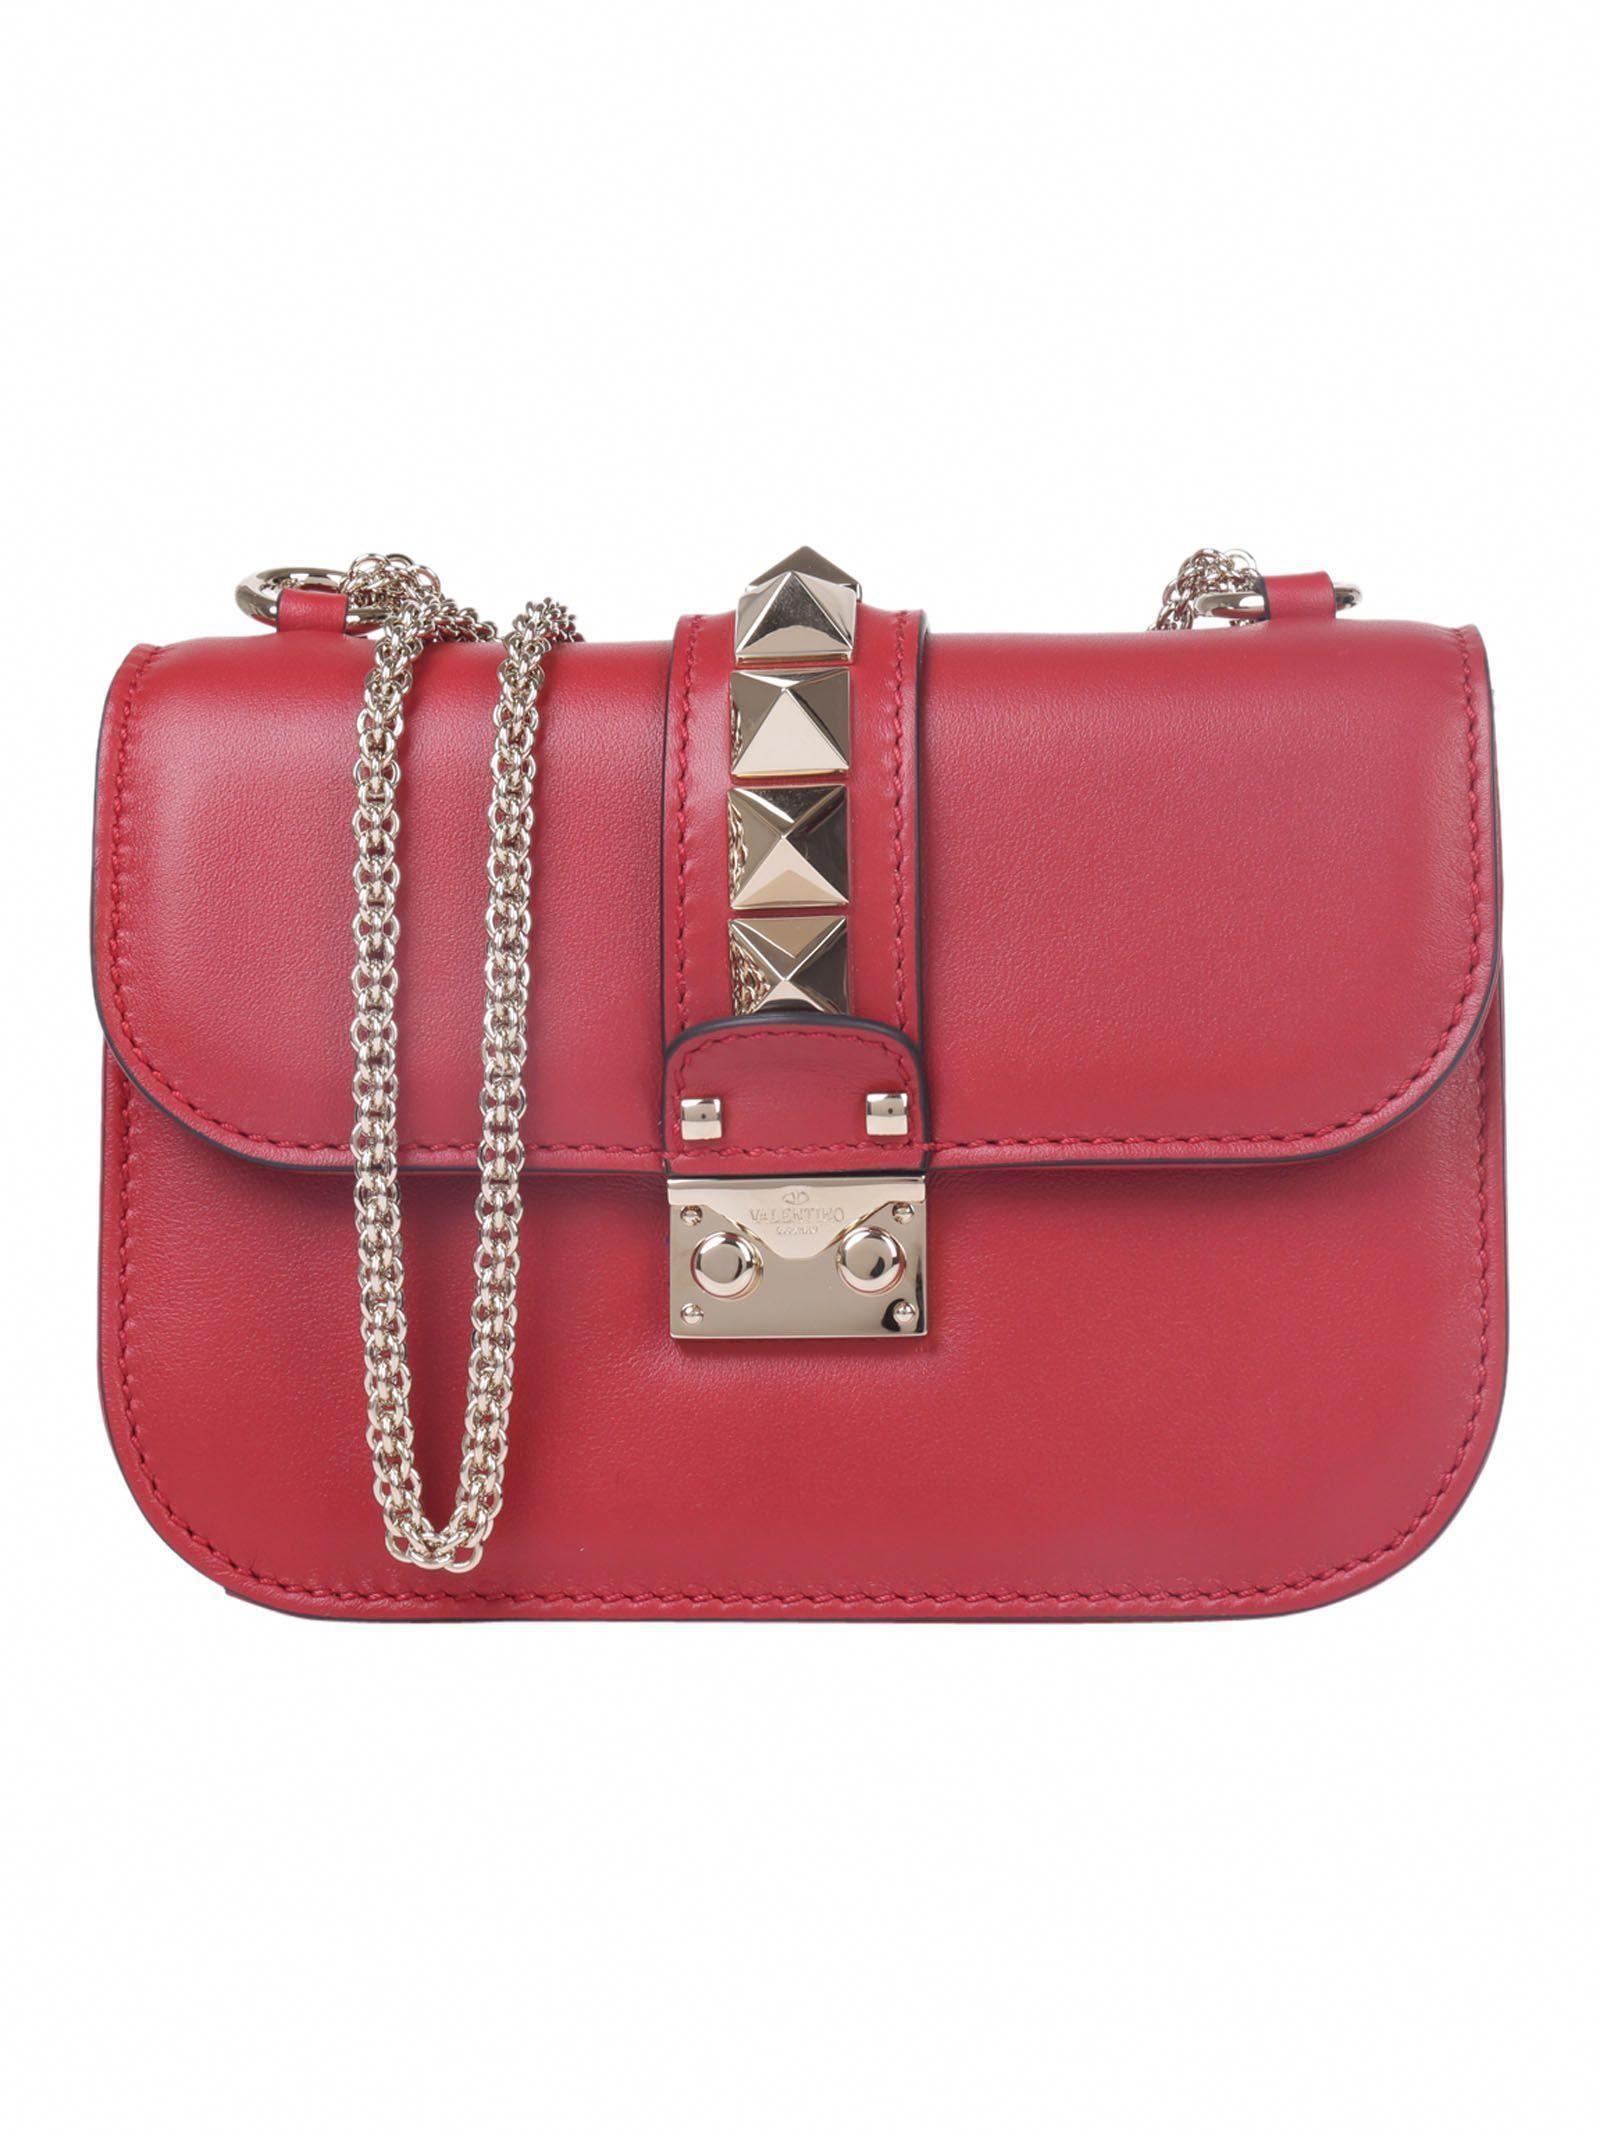 0fab0c90b1 VALENTINO . #valentino #bags #shoulder bags #lining #cotton ...